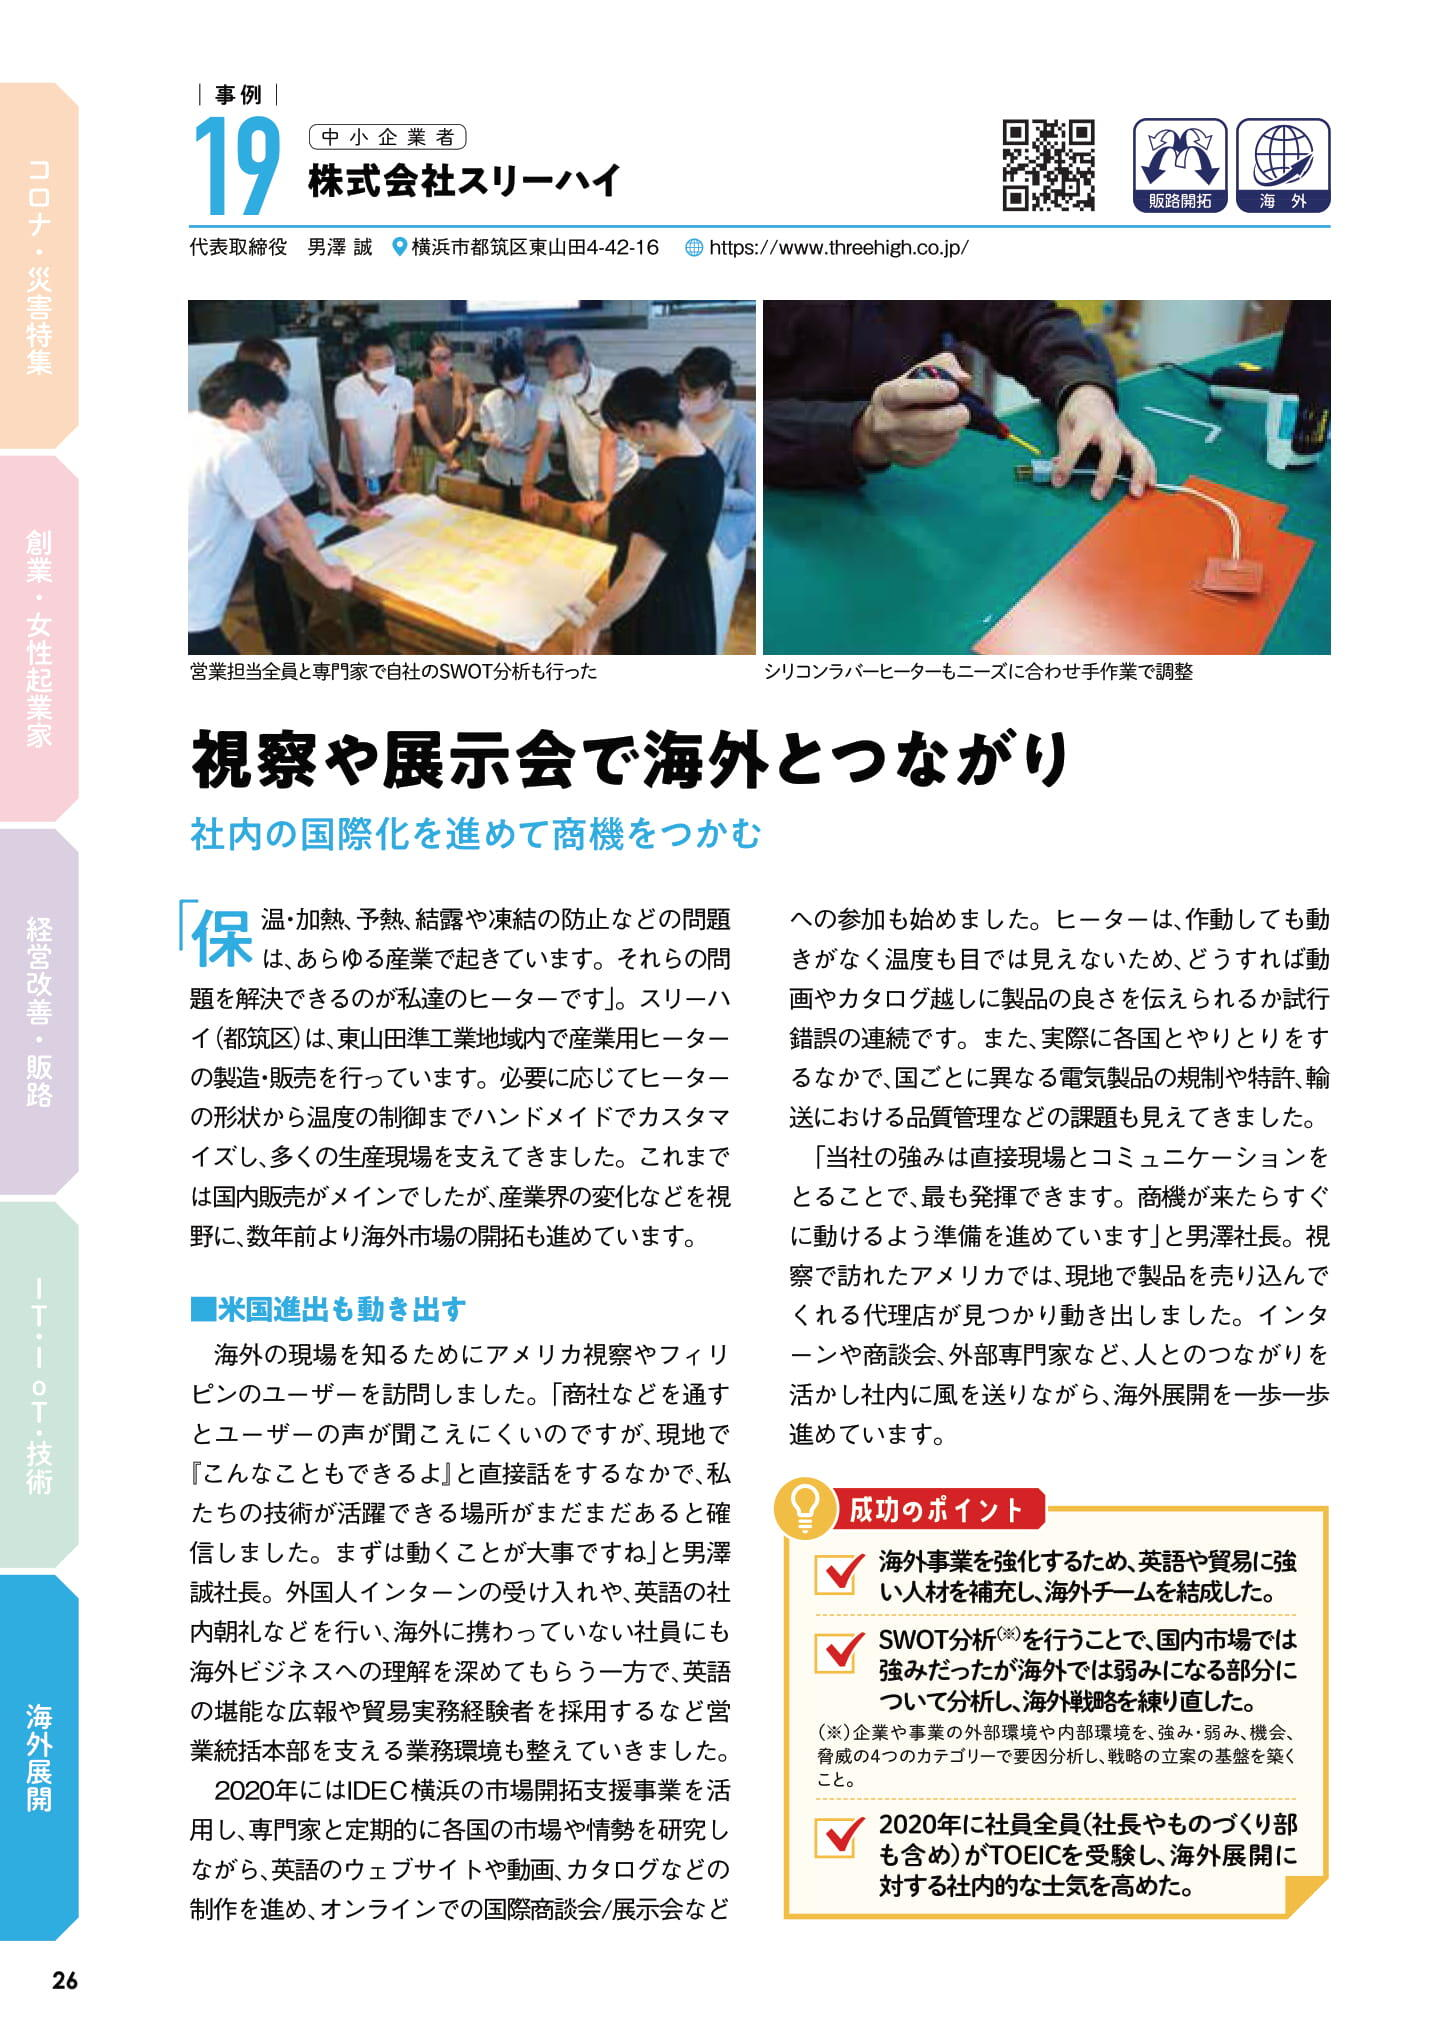 https://www.threehigh.co.jp/info/images/210dec1d6277c01d54b394a6c0ccdf494647fc6c.jpg